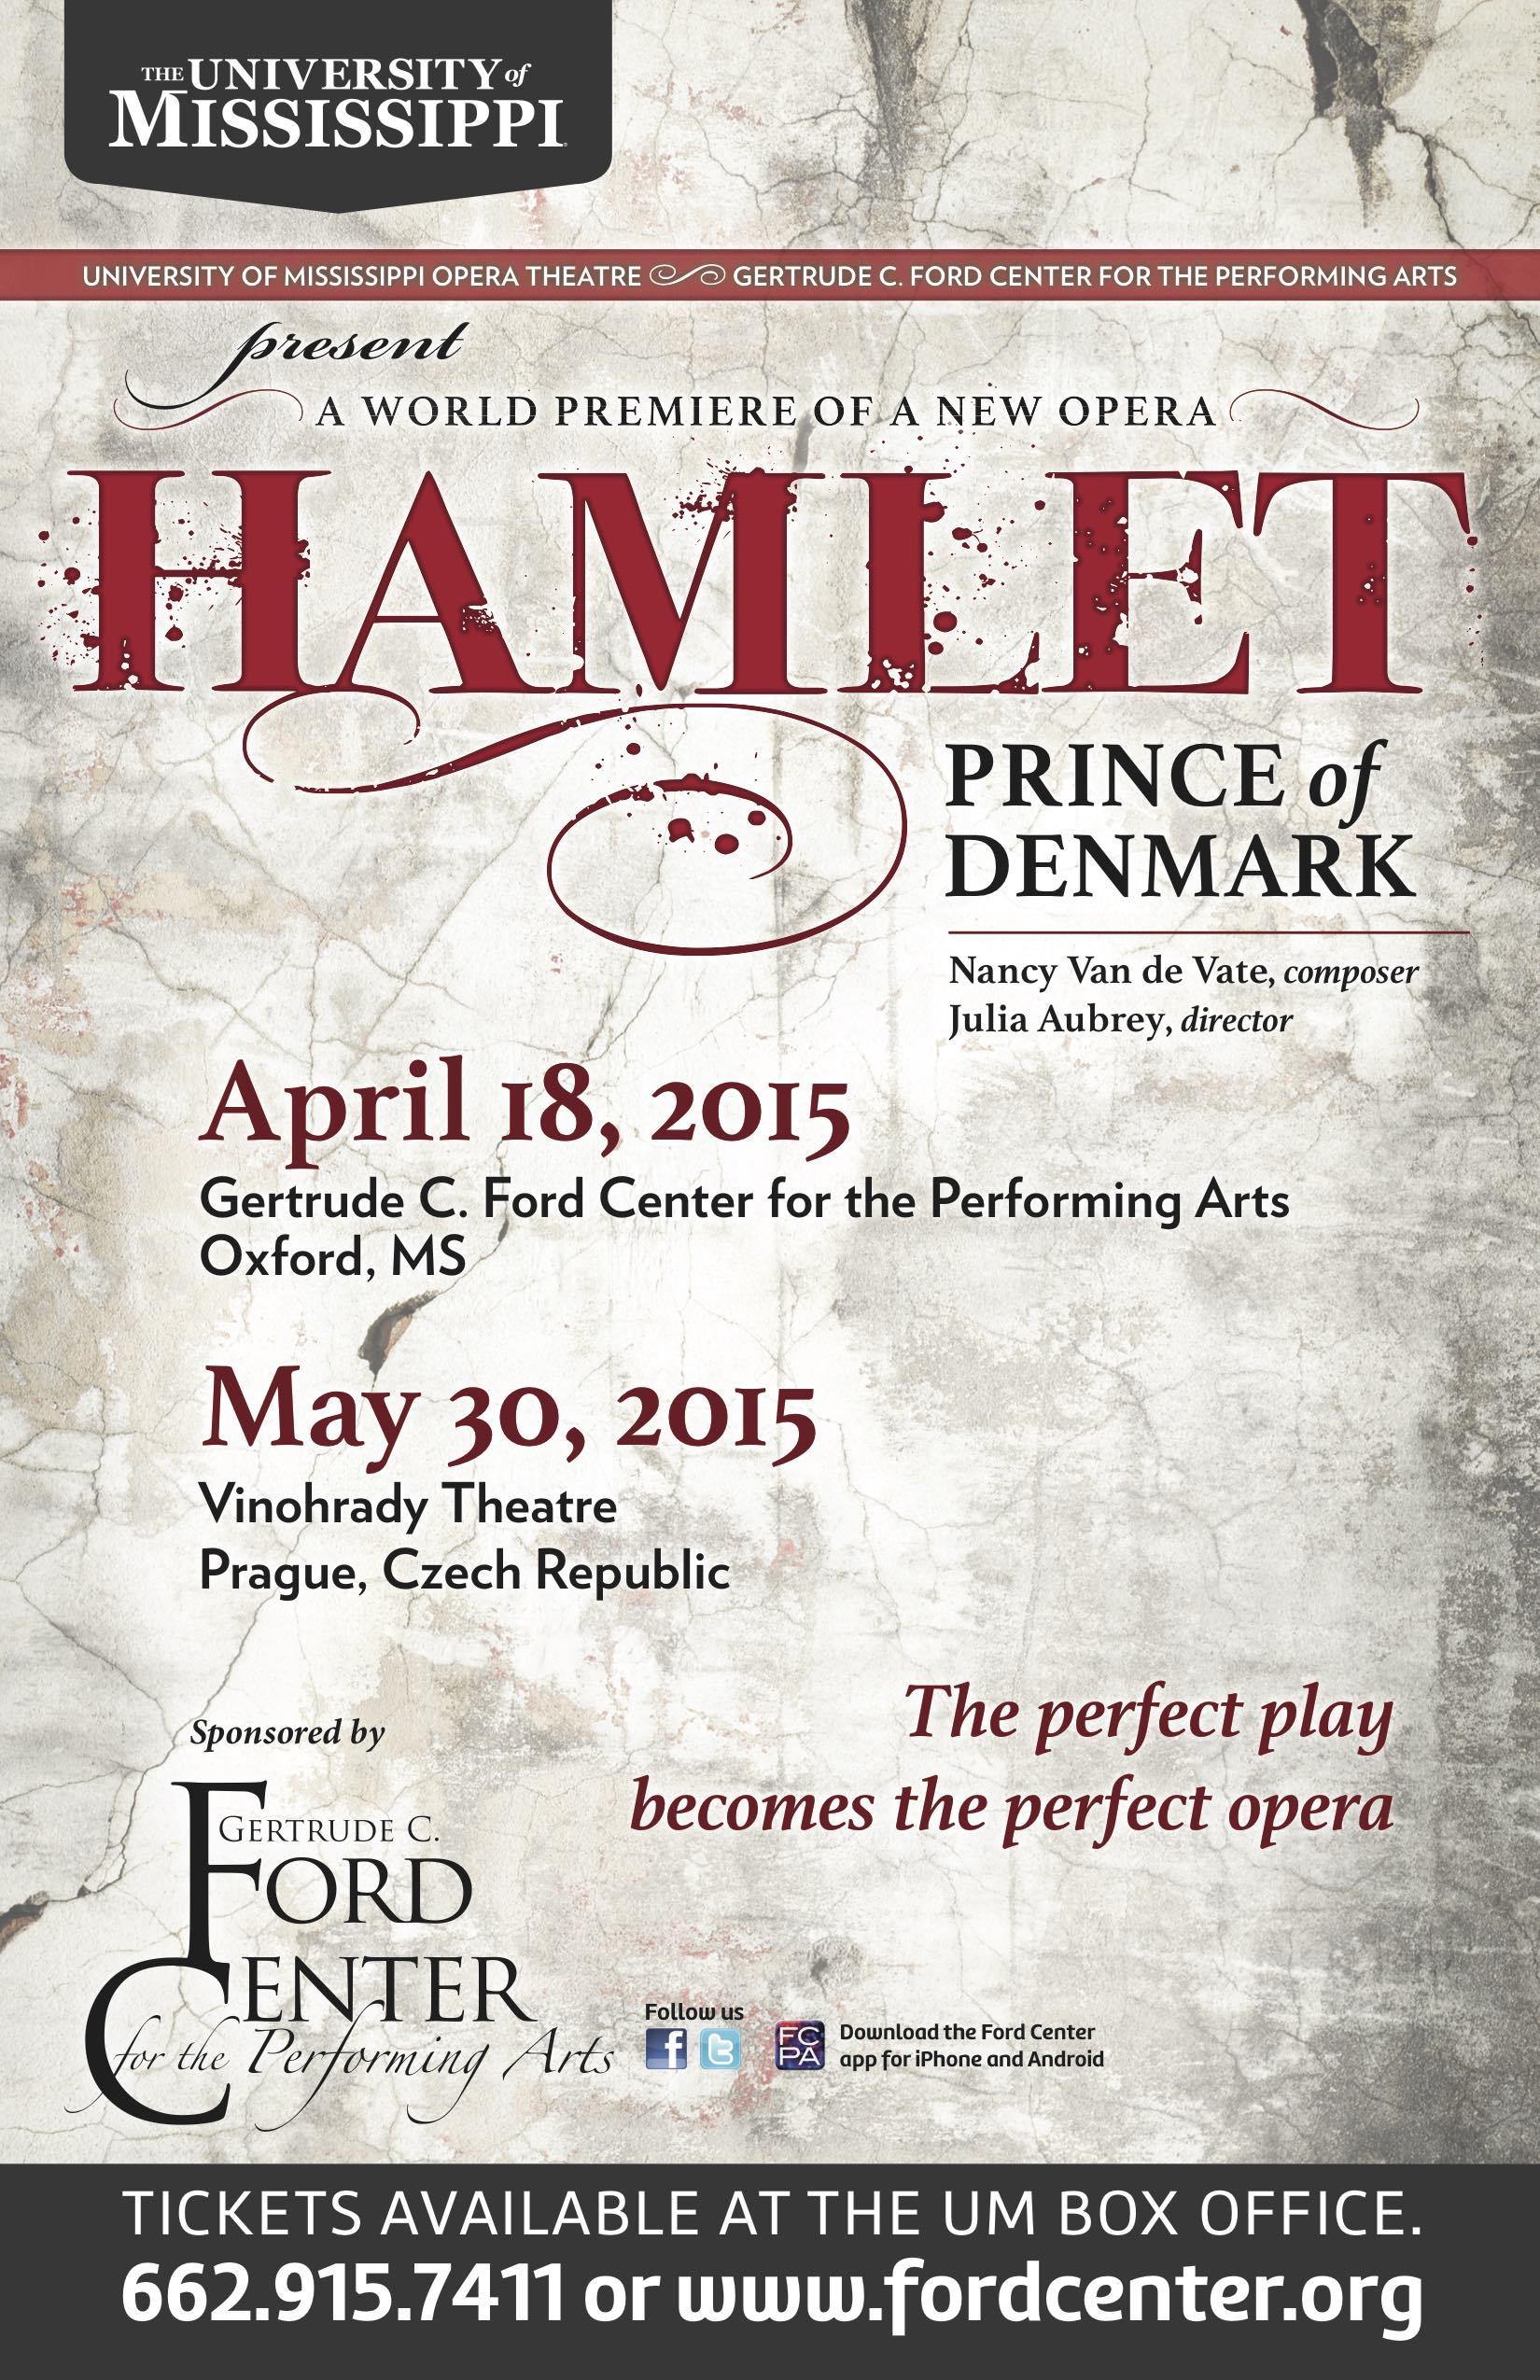 FordCtr-HamletPoster-HR